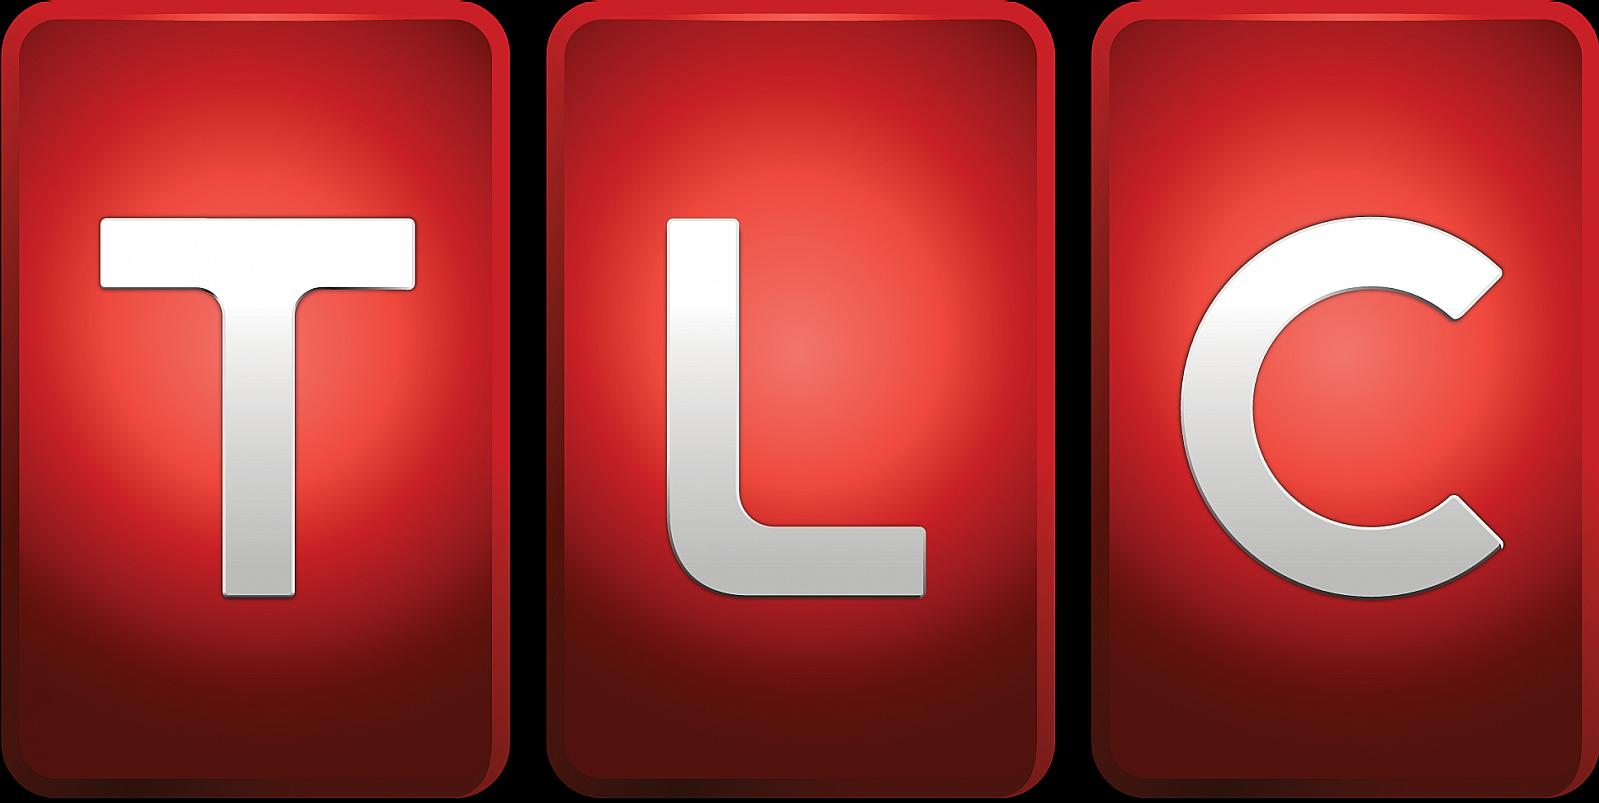 Tlc Logo Uin Wikipedia